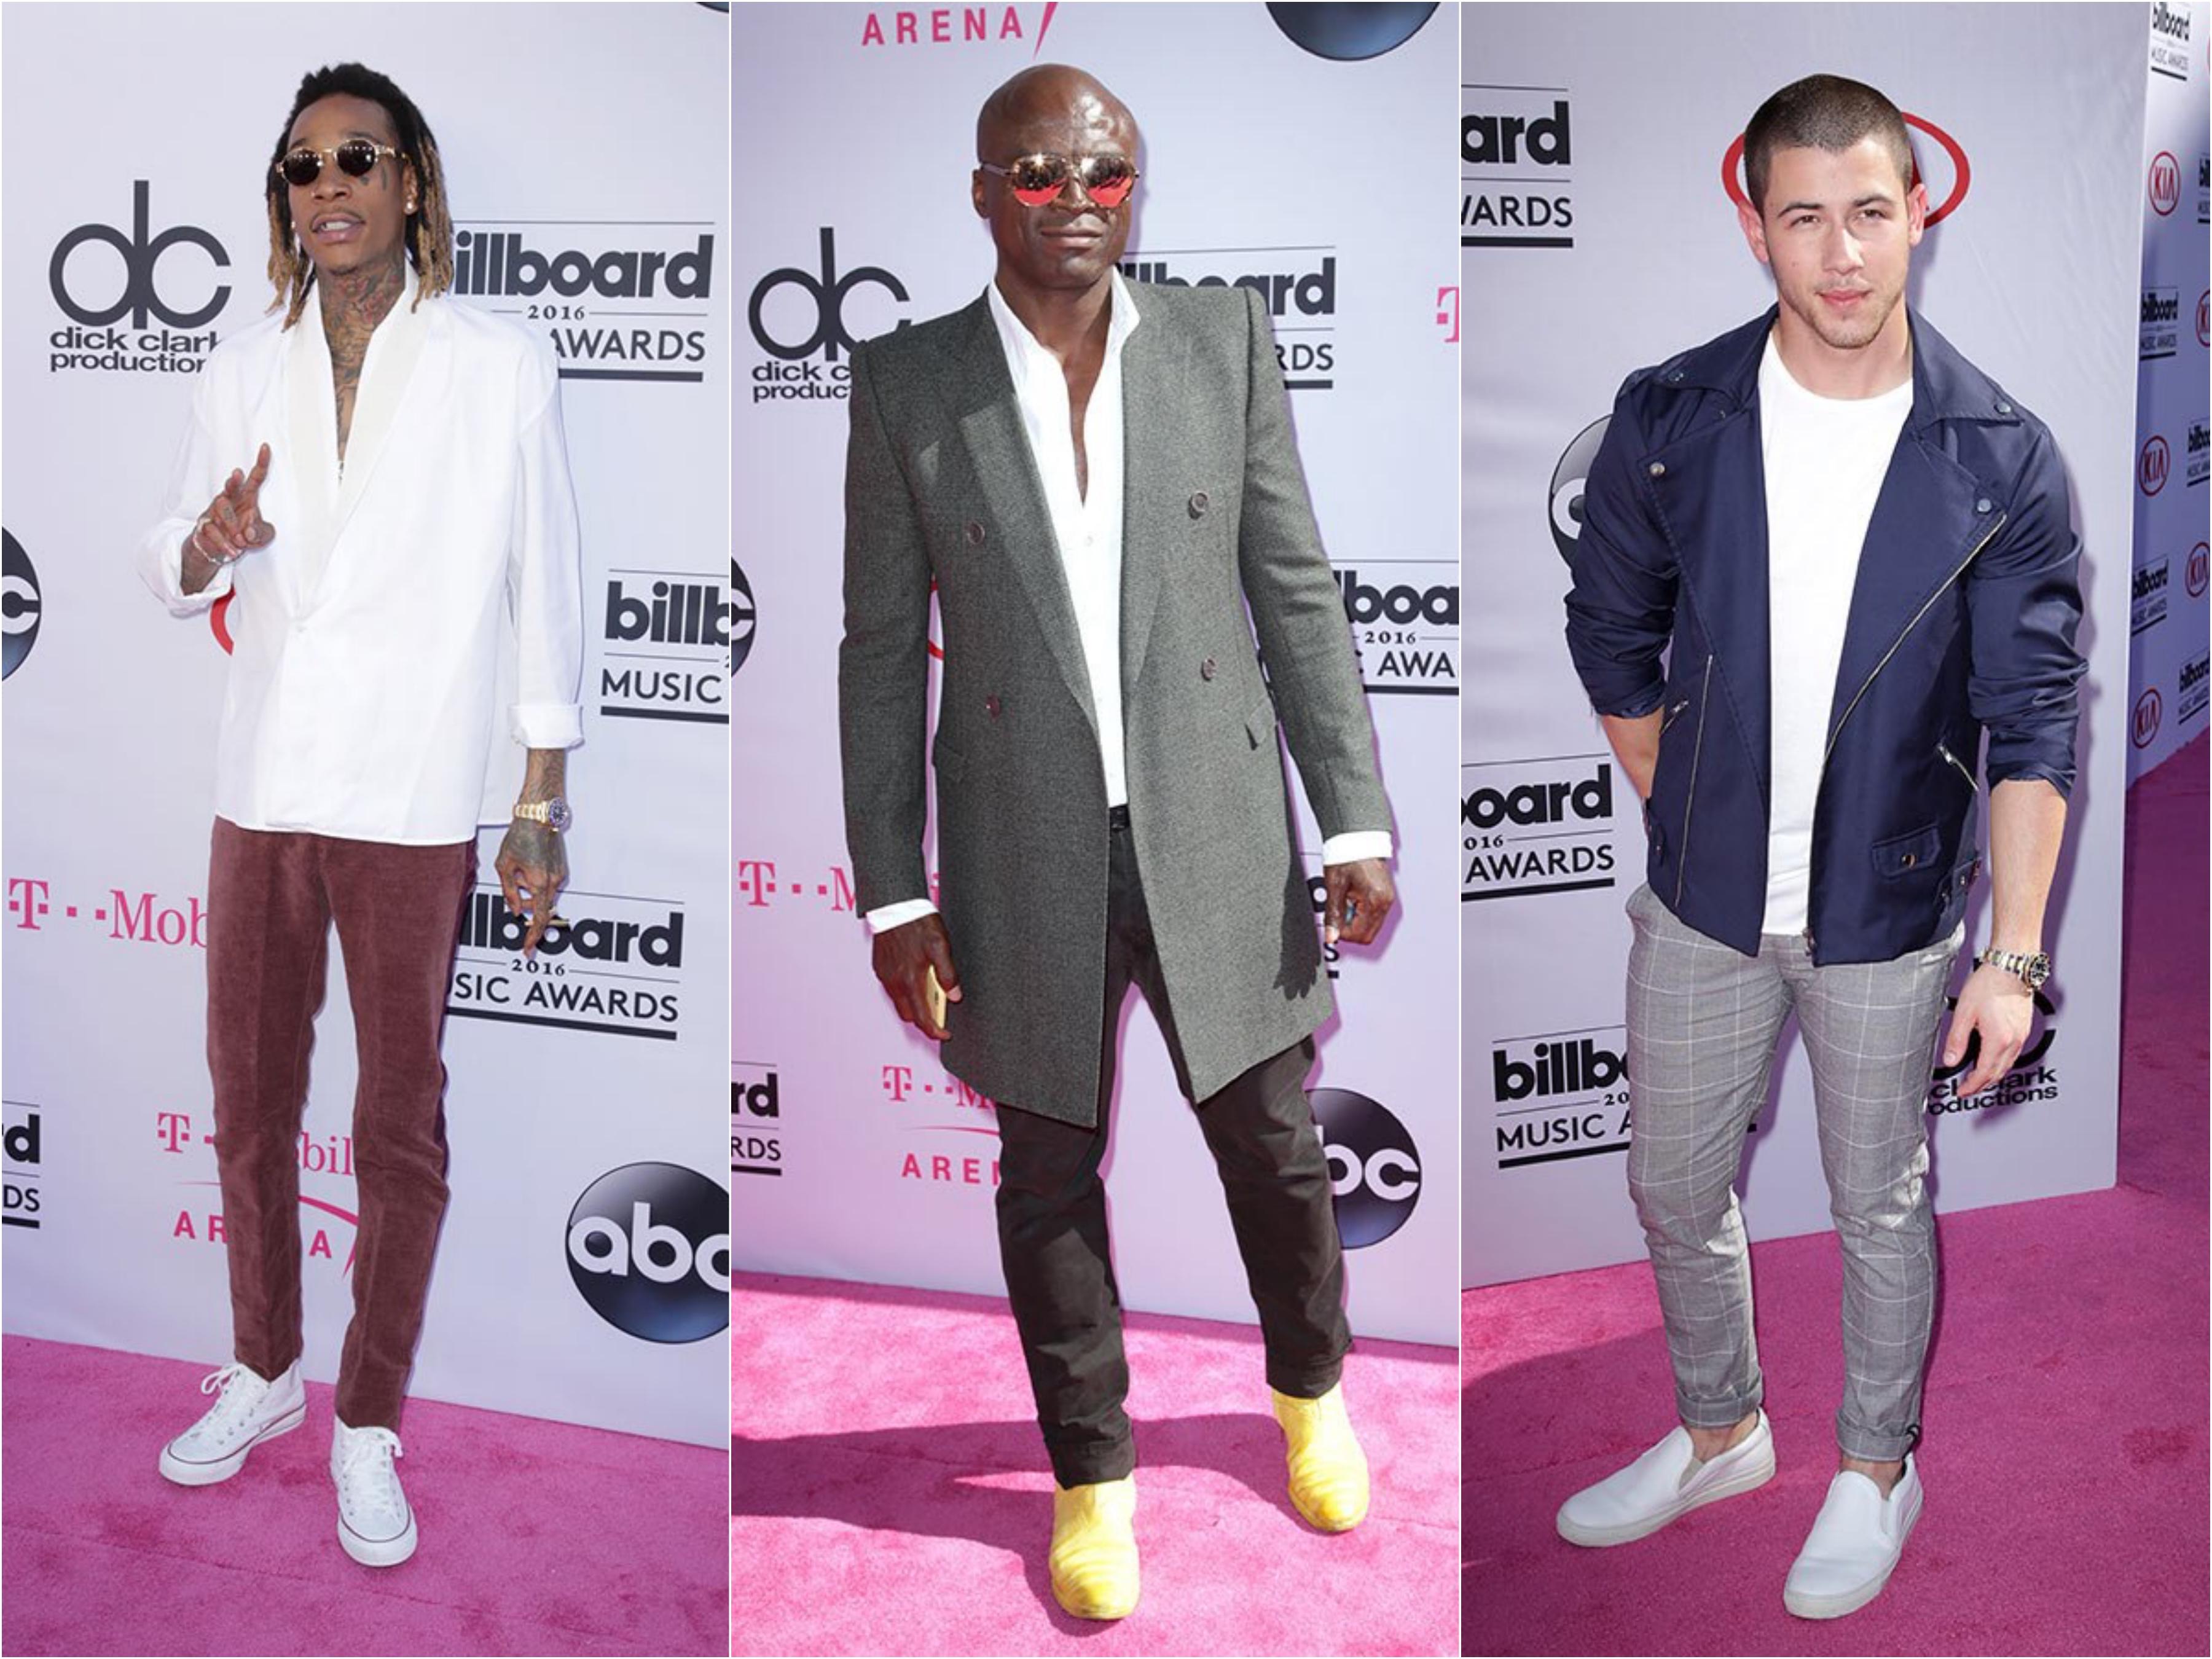 Red Carpet: Billboard Music Awards 2016 Men's Style